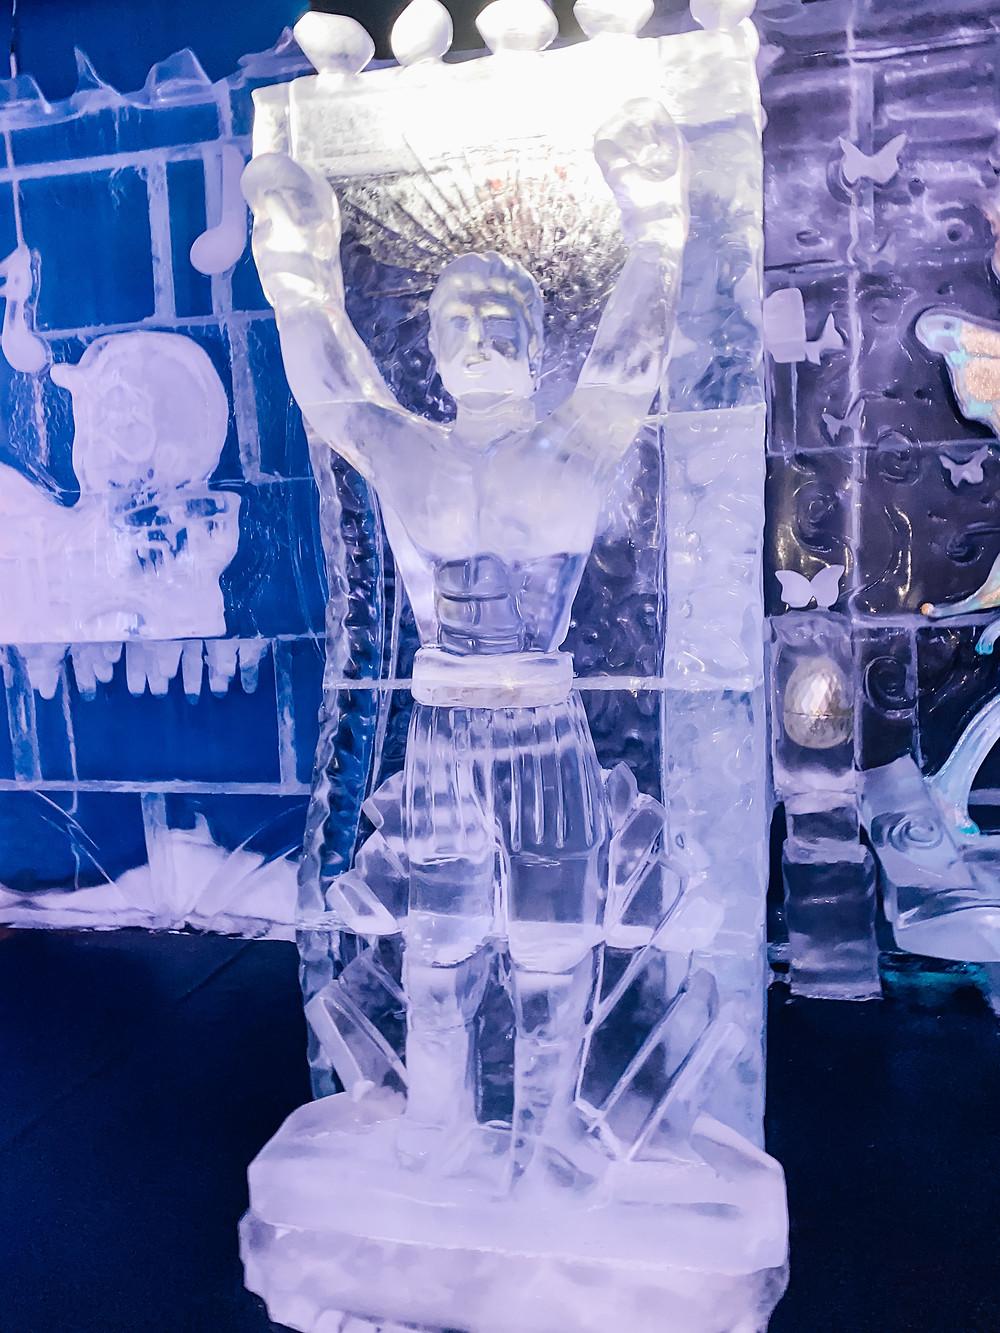 Rocky Balboa Ice Sculpture at Concourse Ice Bar